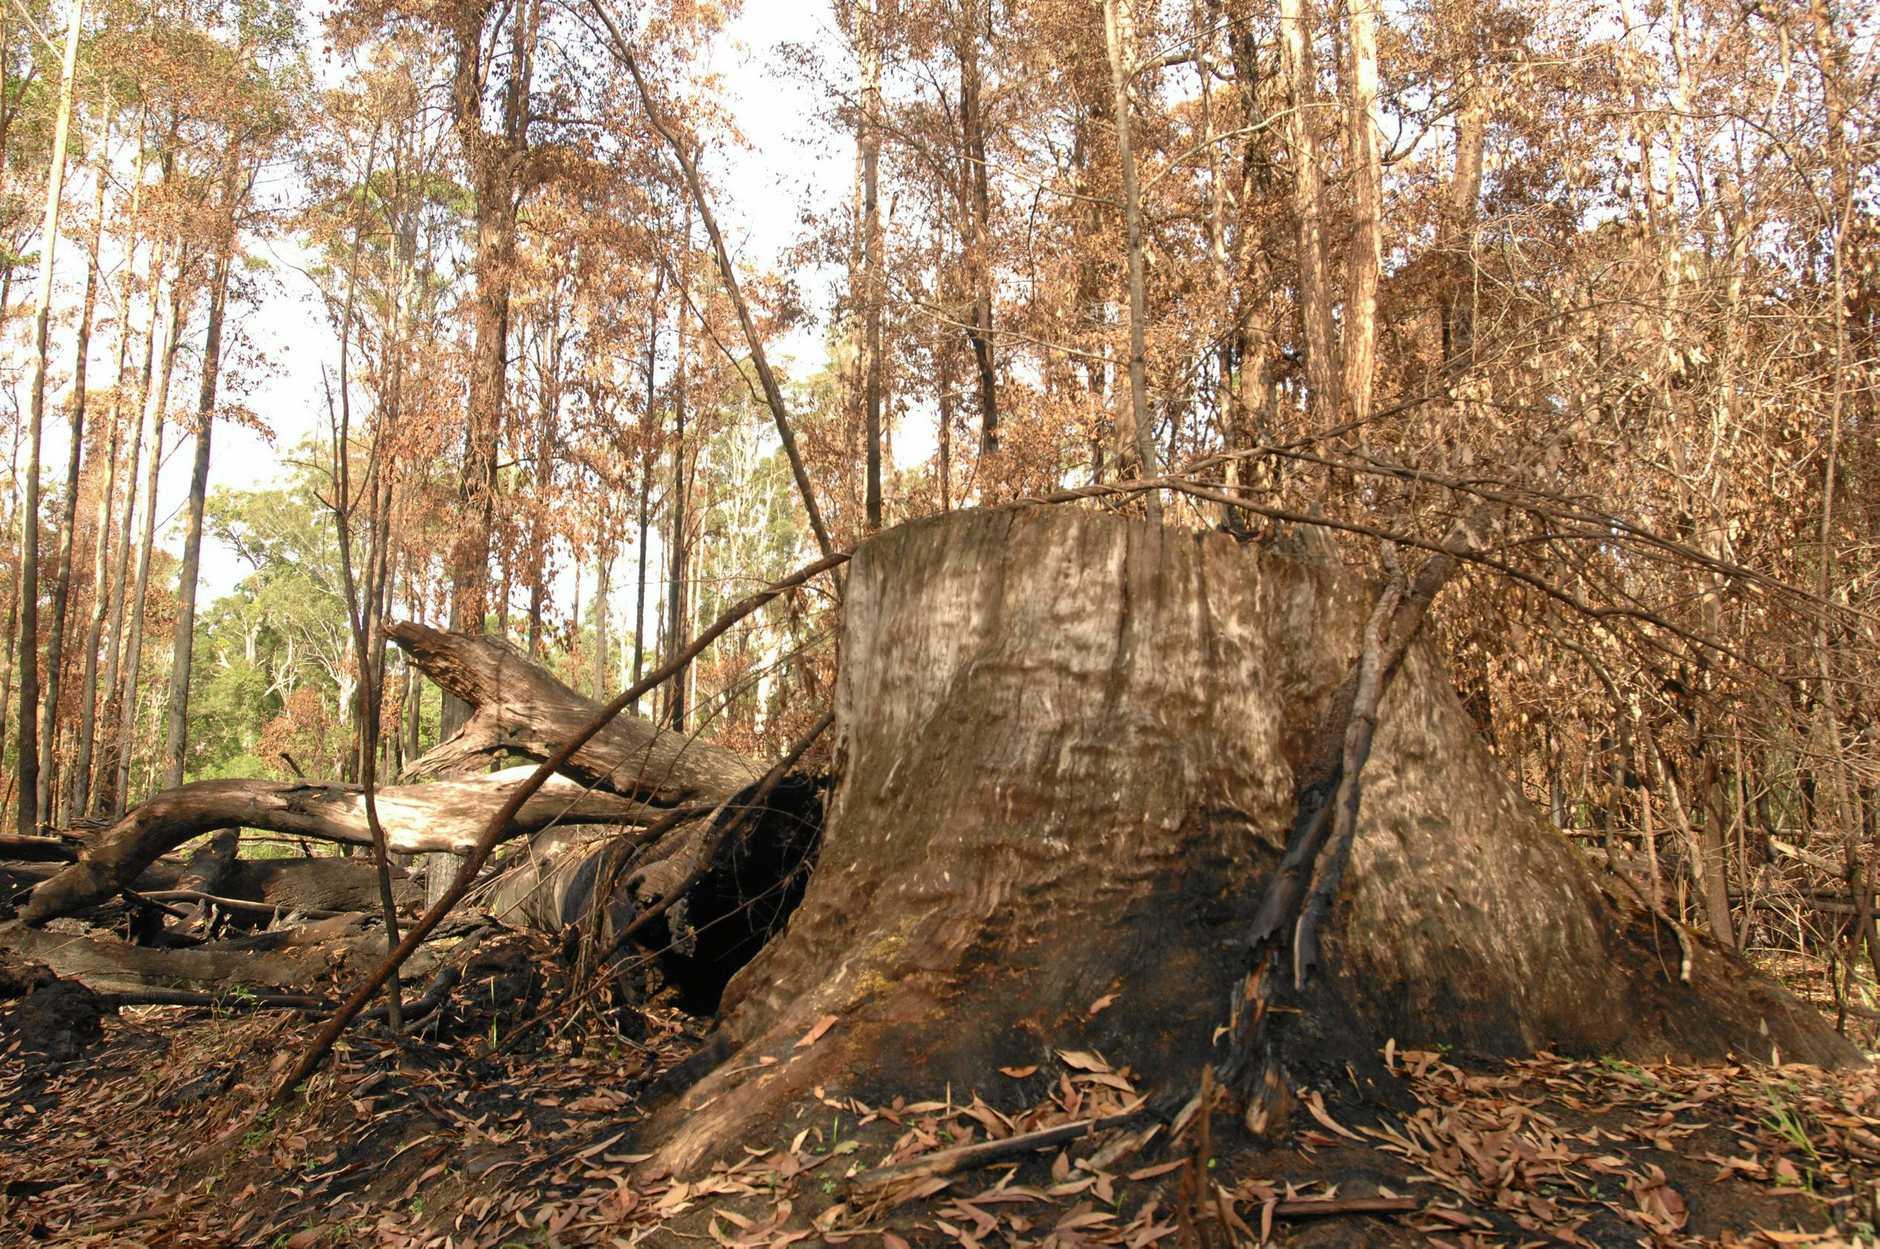 Conservation groups are urging a rethink on native forest logging.